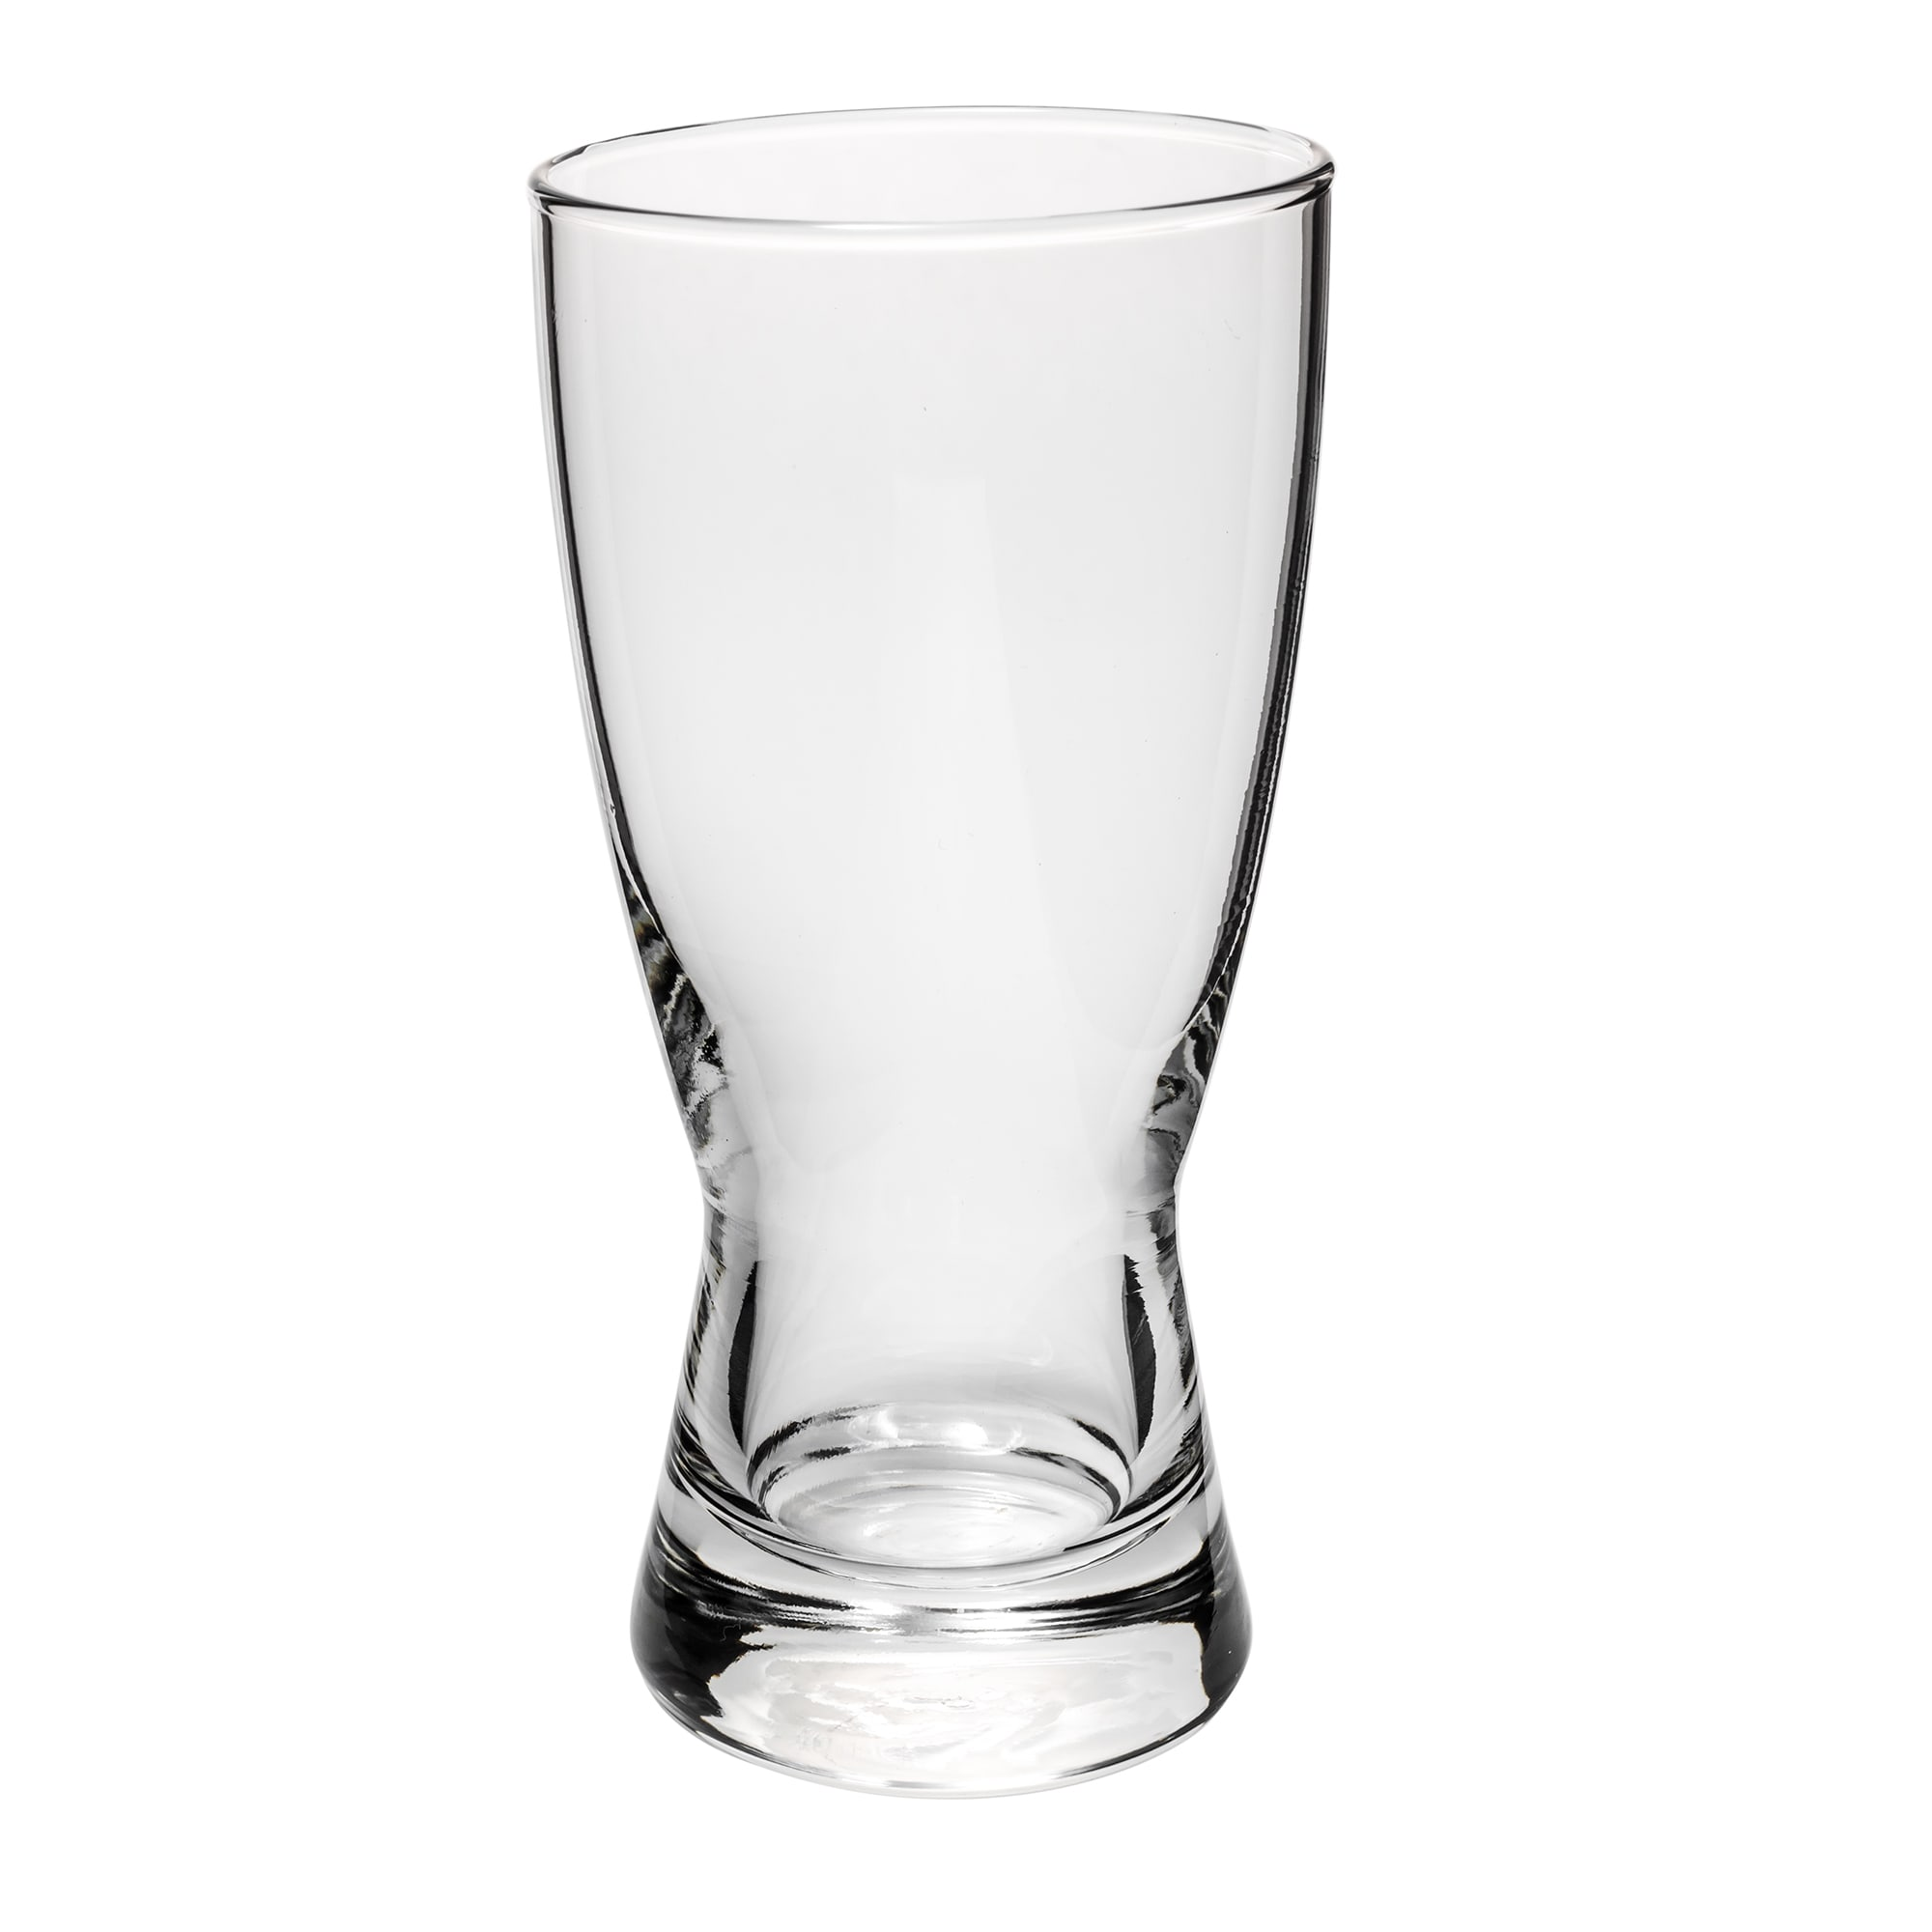 Libbey 178 10 oz Hourglass Design Pilsner Glass - Safedge Rim Guarantee